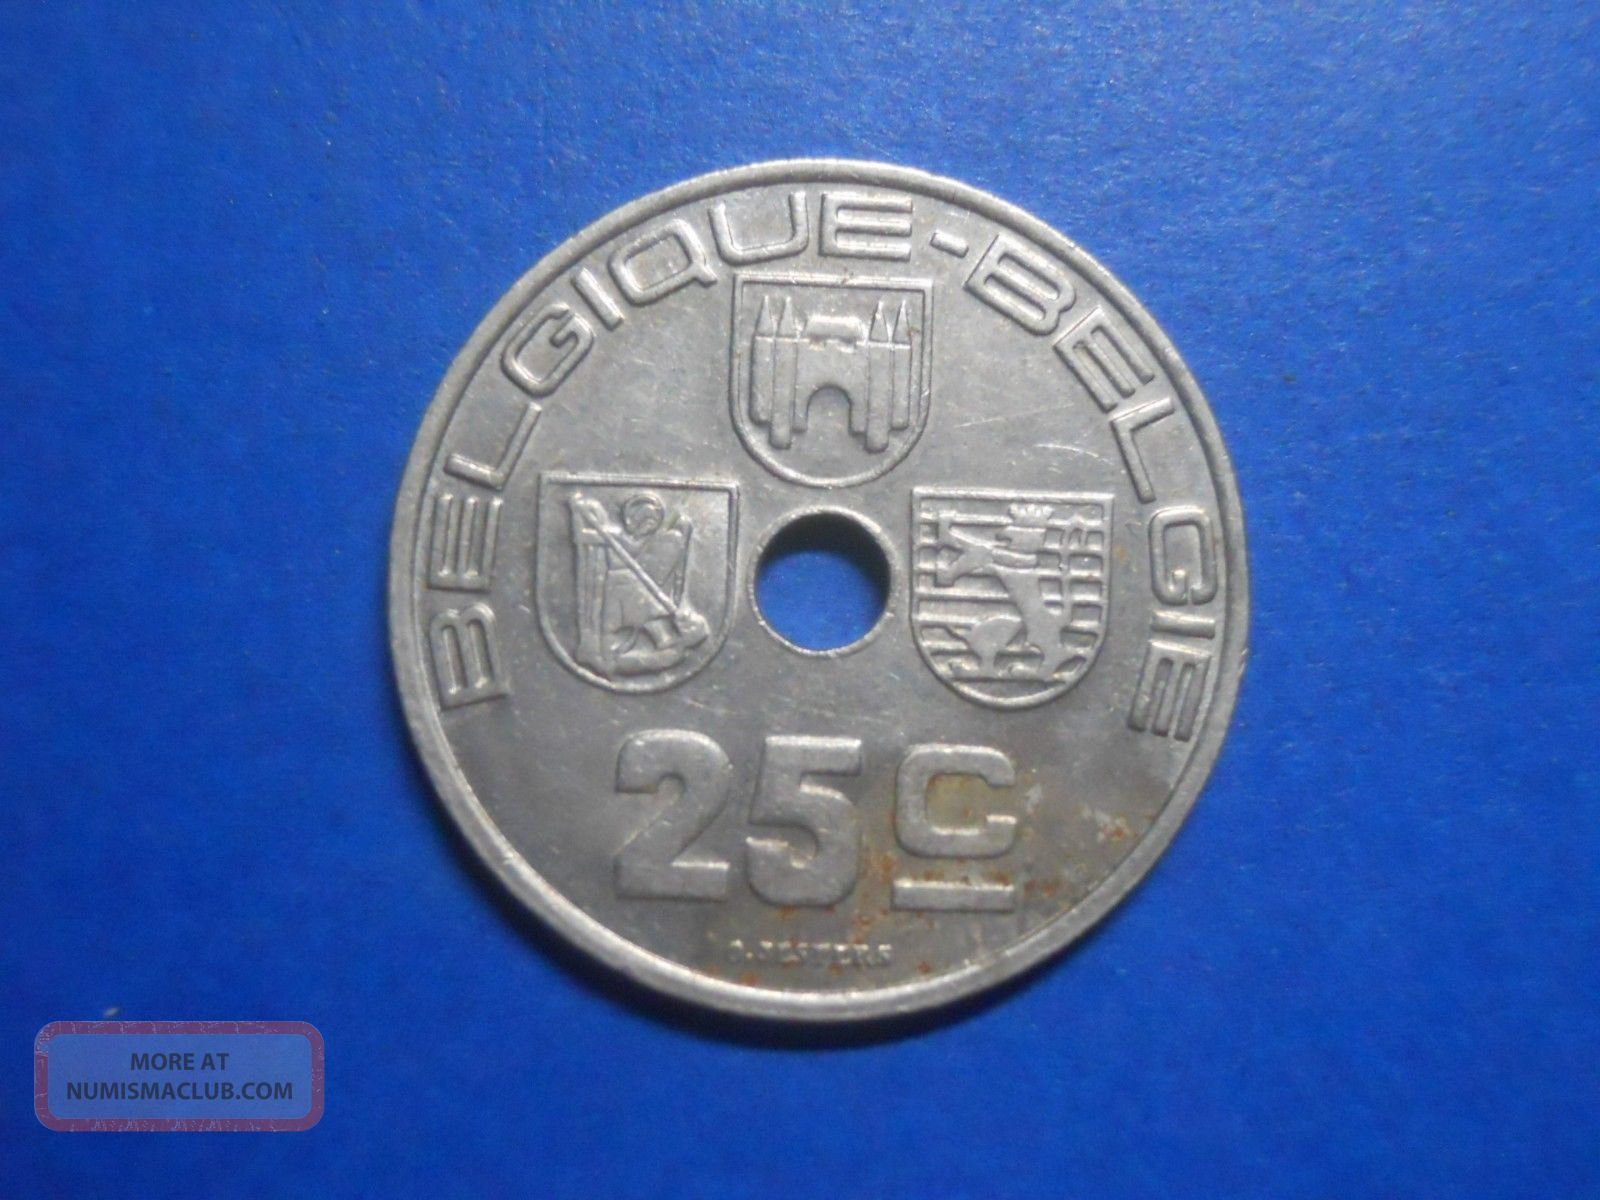 Belgium - Nickel Brass - 25 Centimes - 1939 Europe photo